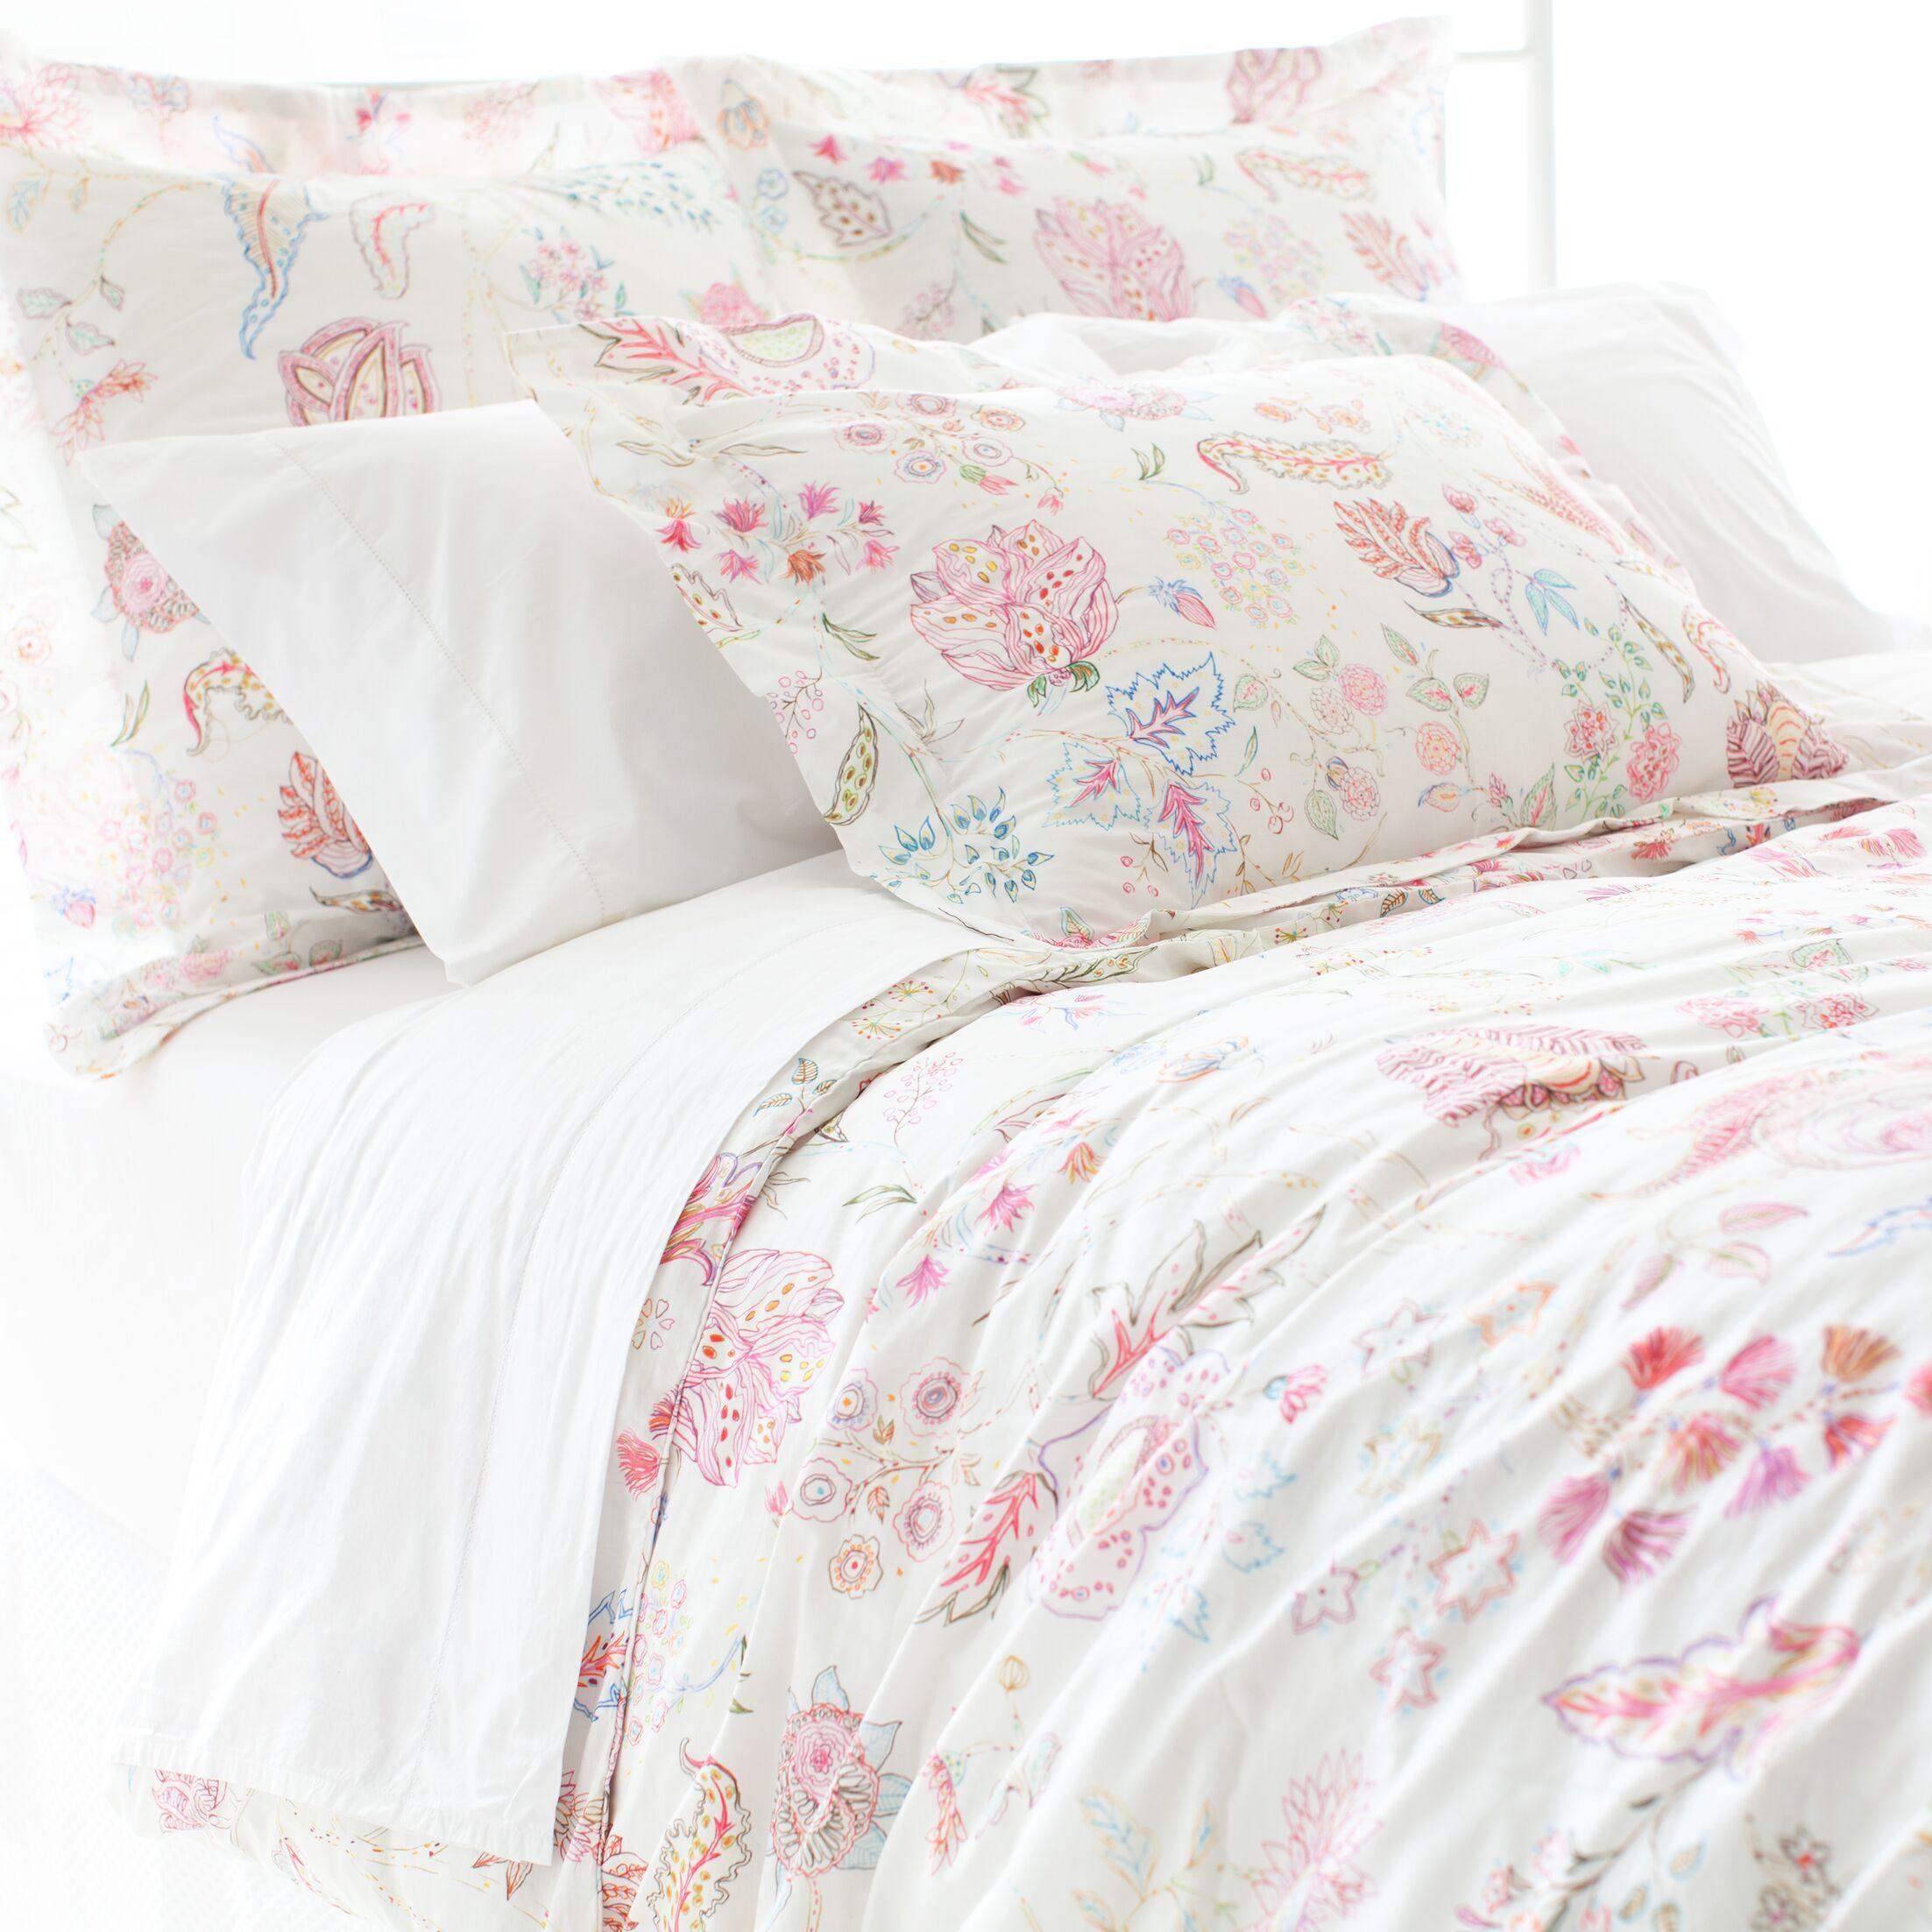 Mirabelle 200 Thread Count 100% Cotton Sheet Set Size: Full